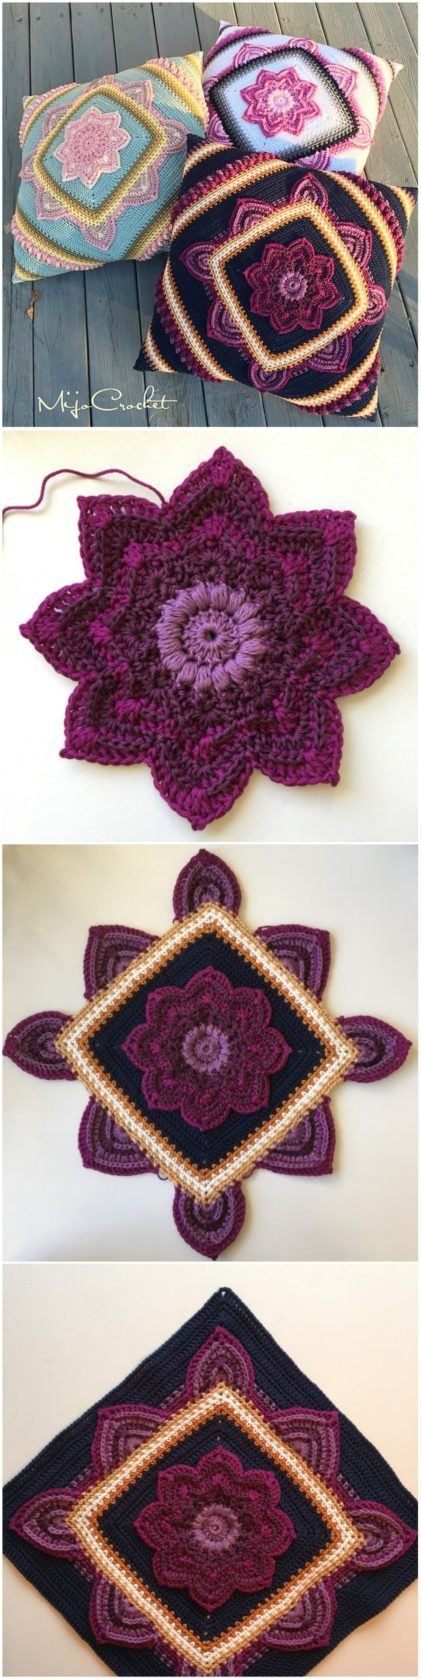 Crochet Blooming Flower Square - Free Pattern - Yarnandhooks